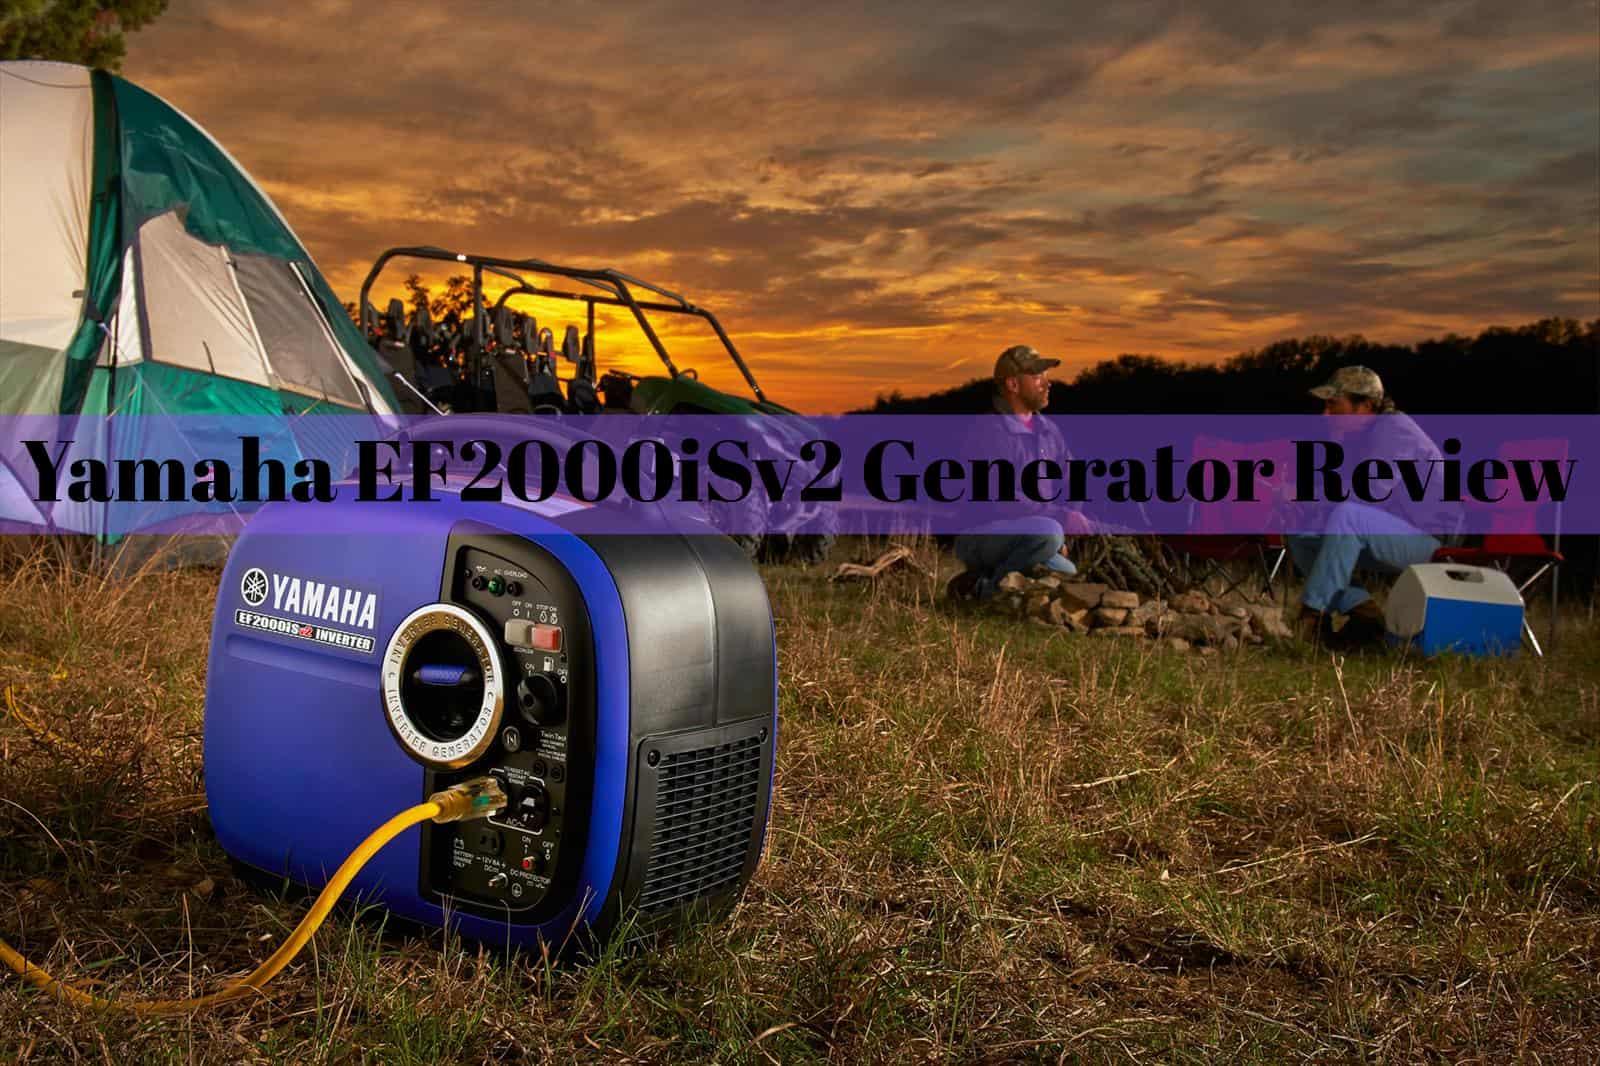 Yamaha EF2000iSv2 Portable Generator Review - EnstorageInc